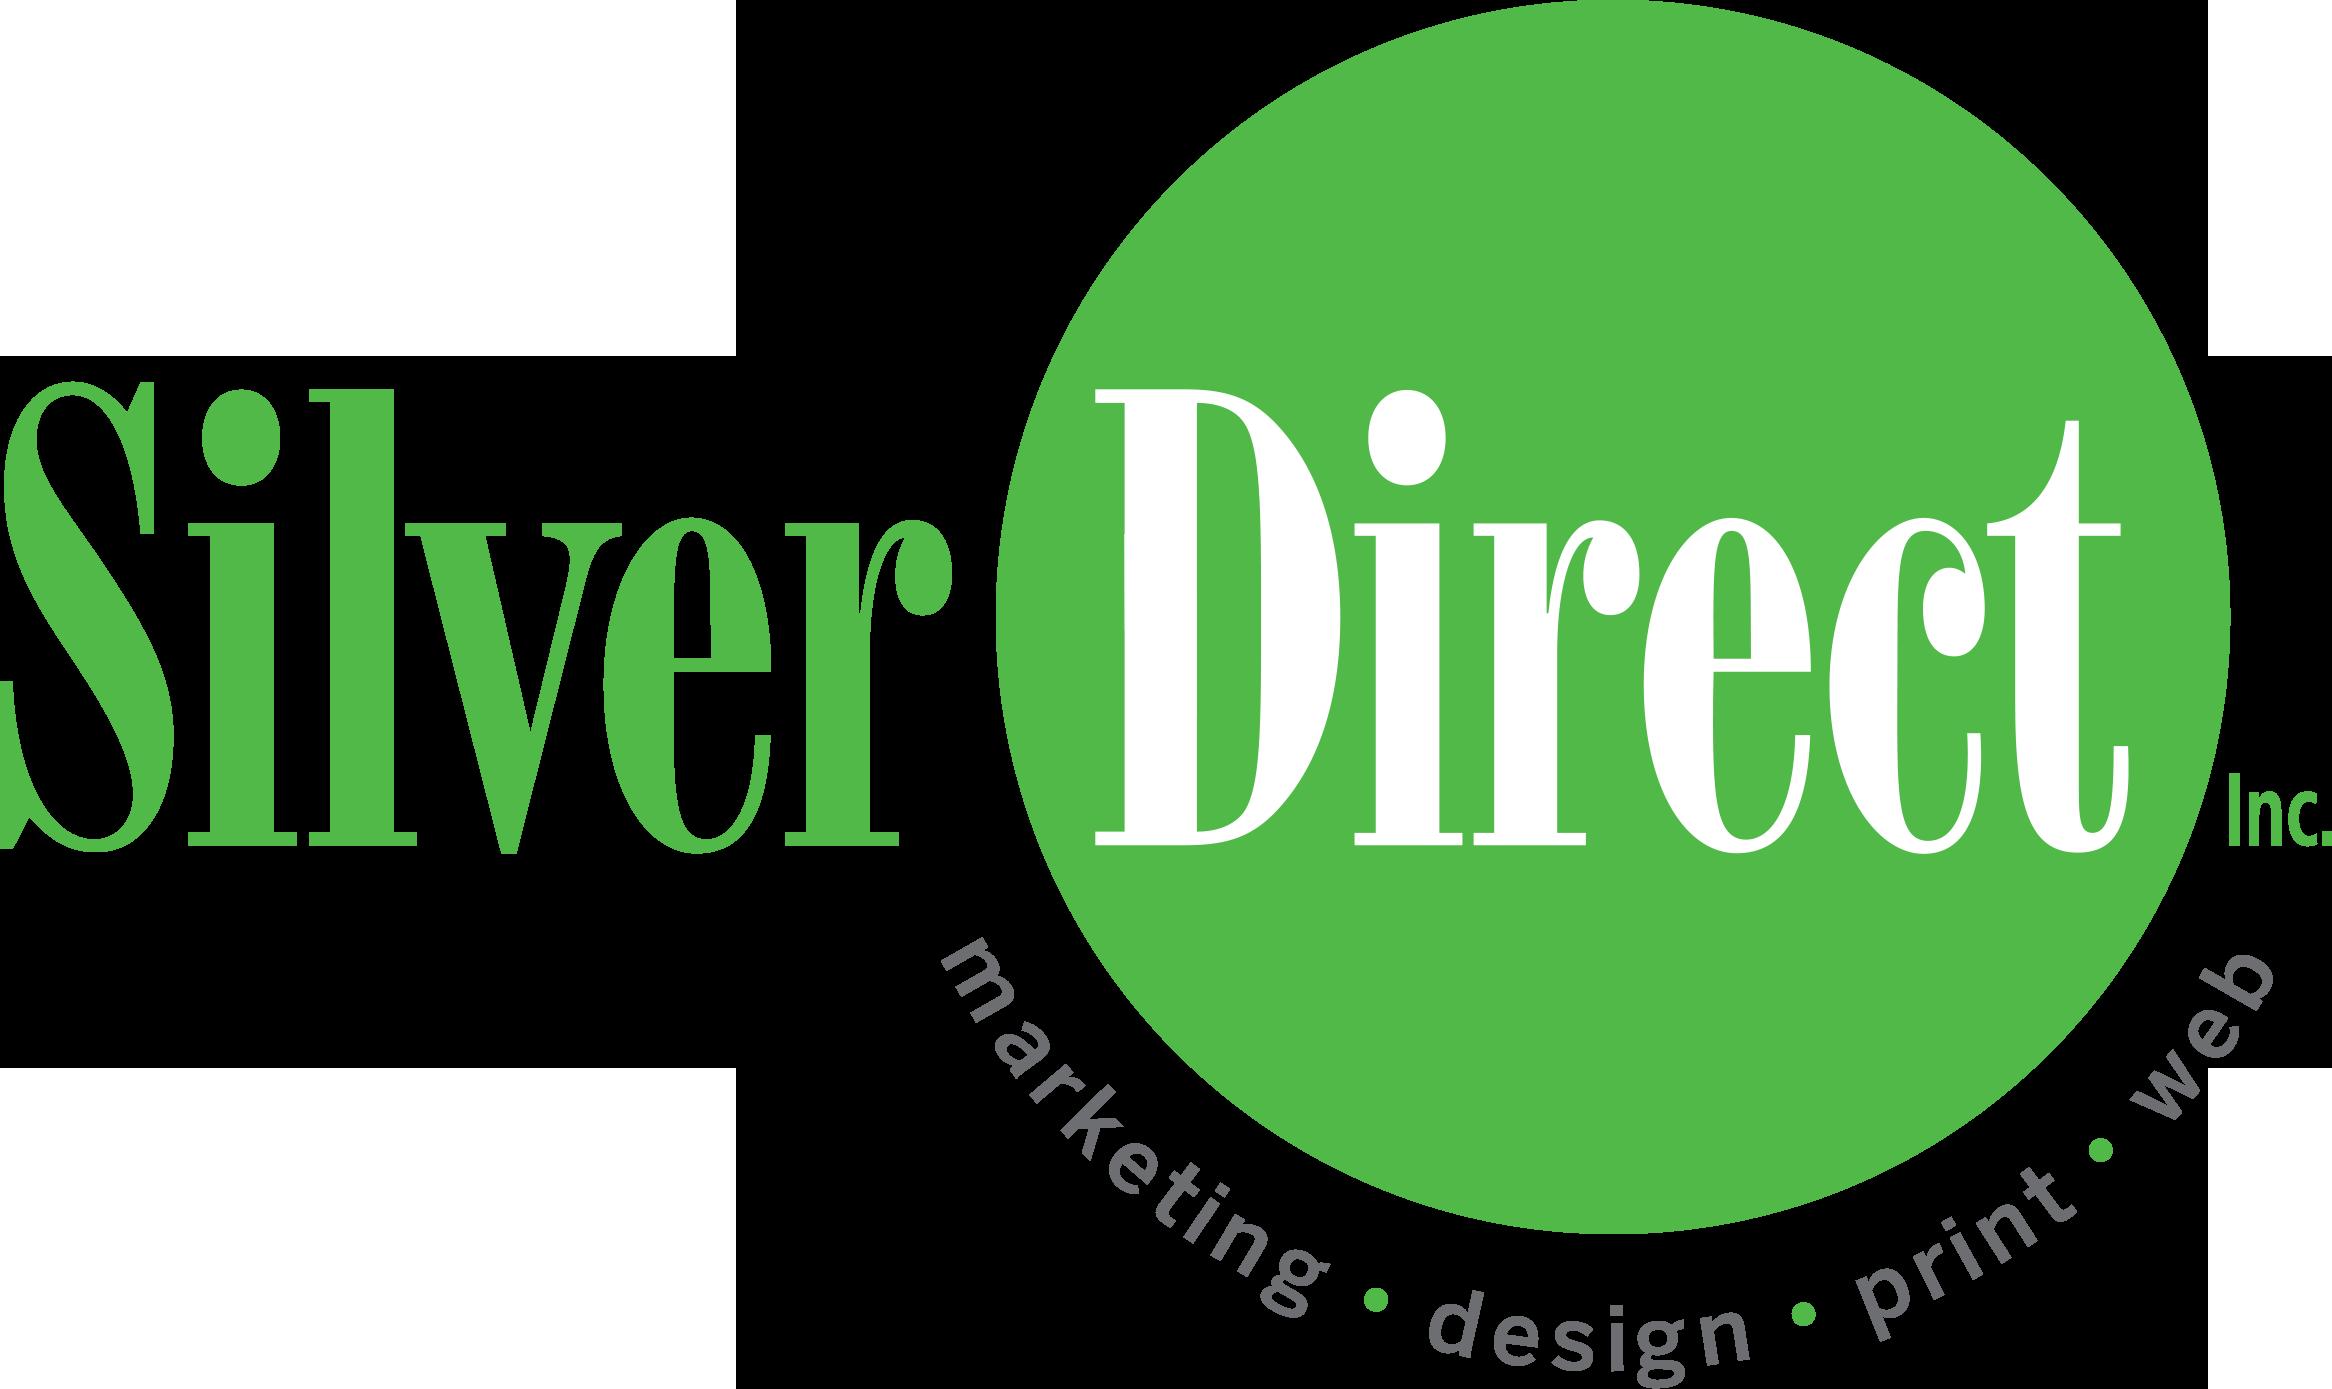 Silver Direct